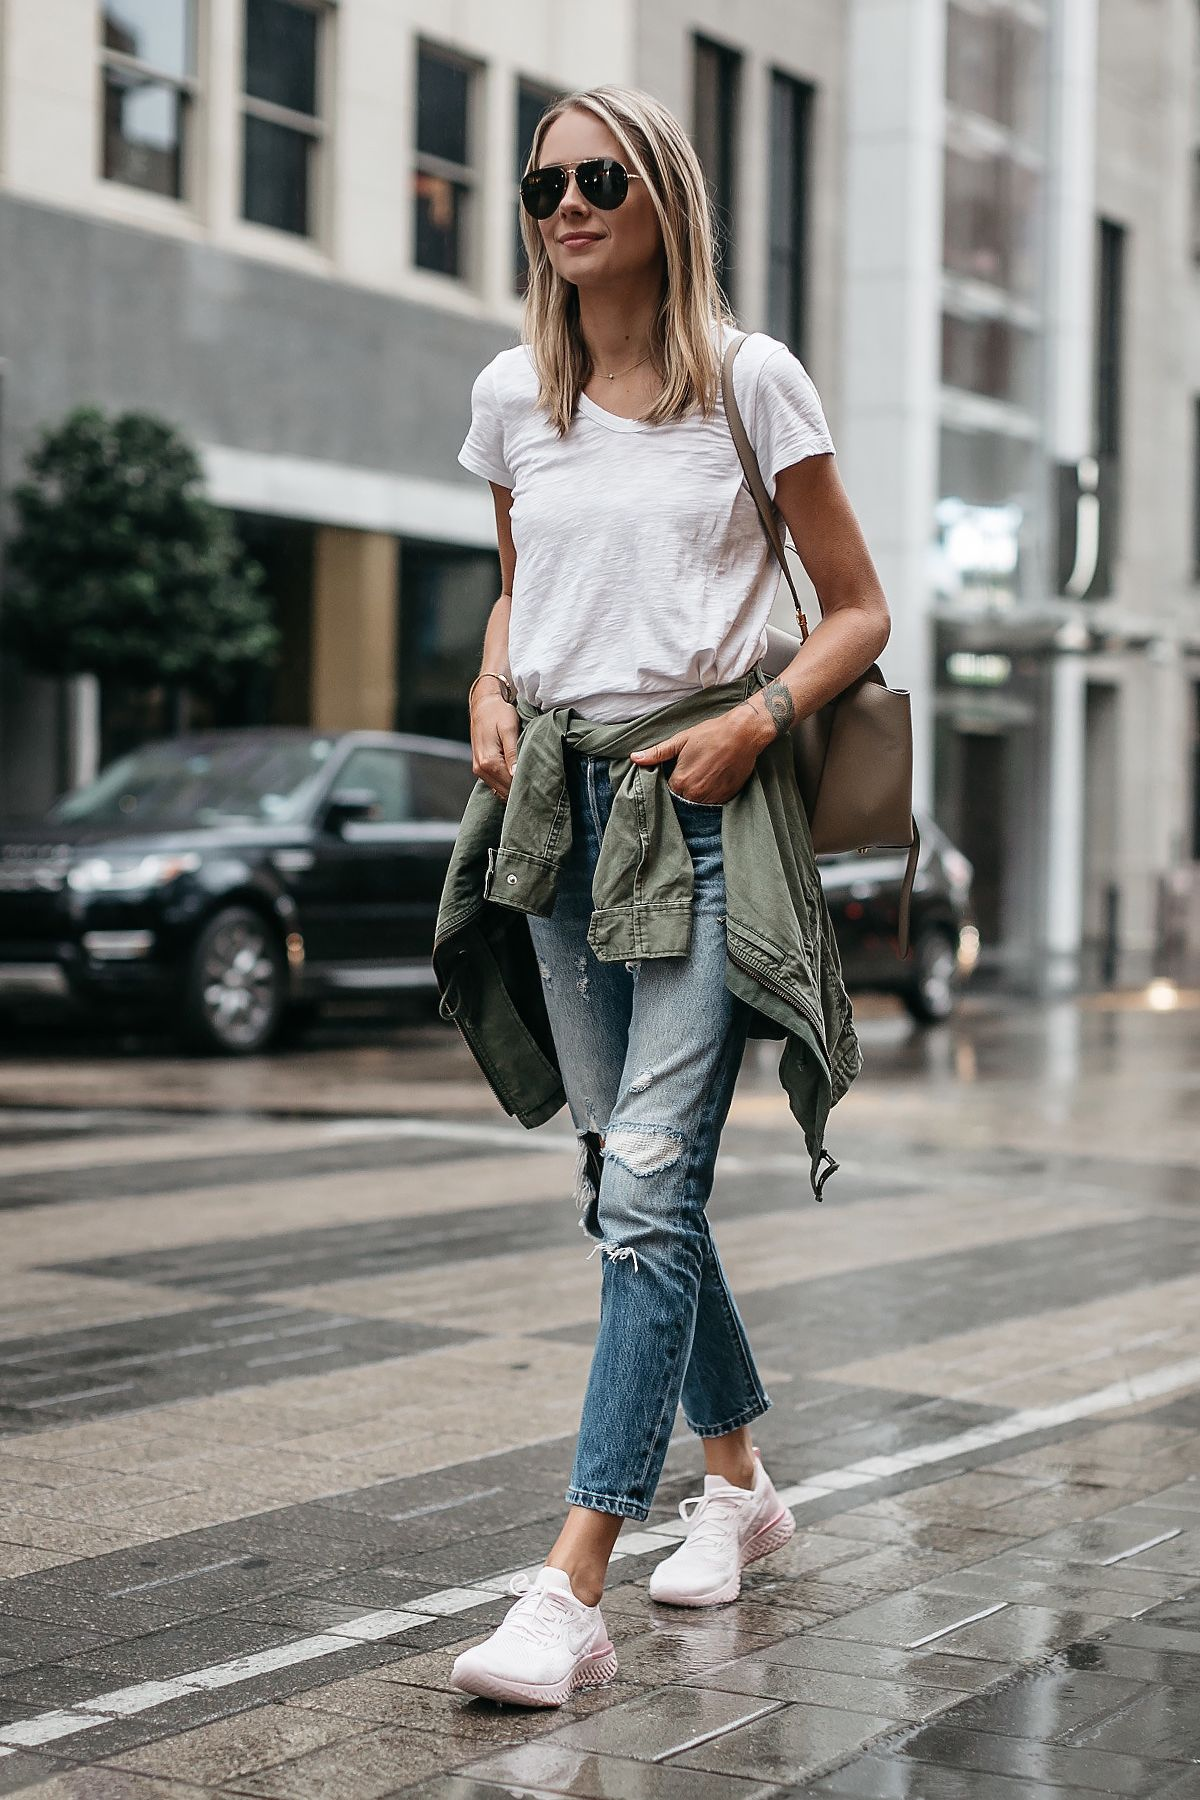 20ebe83b22a ... Woman Wearing Nike React Running Shoe White Tshirt Ripped Denim Jeans  Green Utility Jacket Fashion Jackson Dallas Blogger Fashion Blogger Street  Style